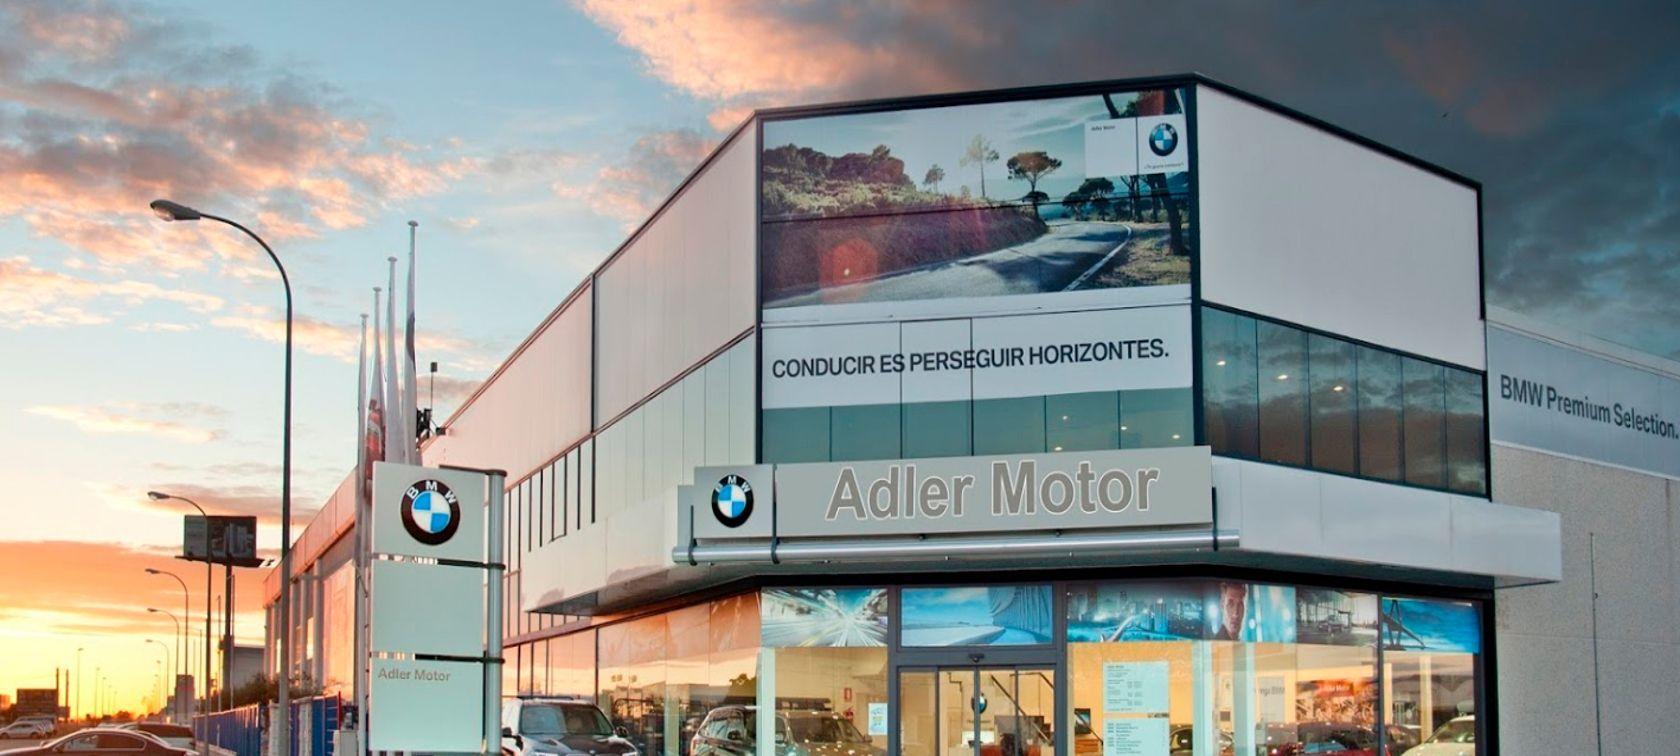 Adler Motor - Cazalegas